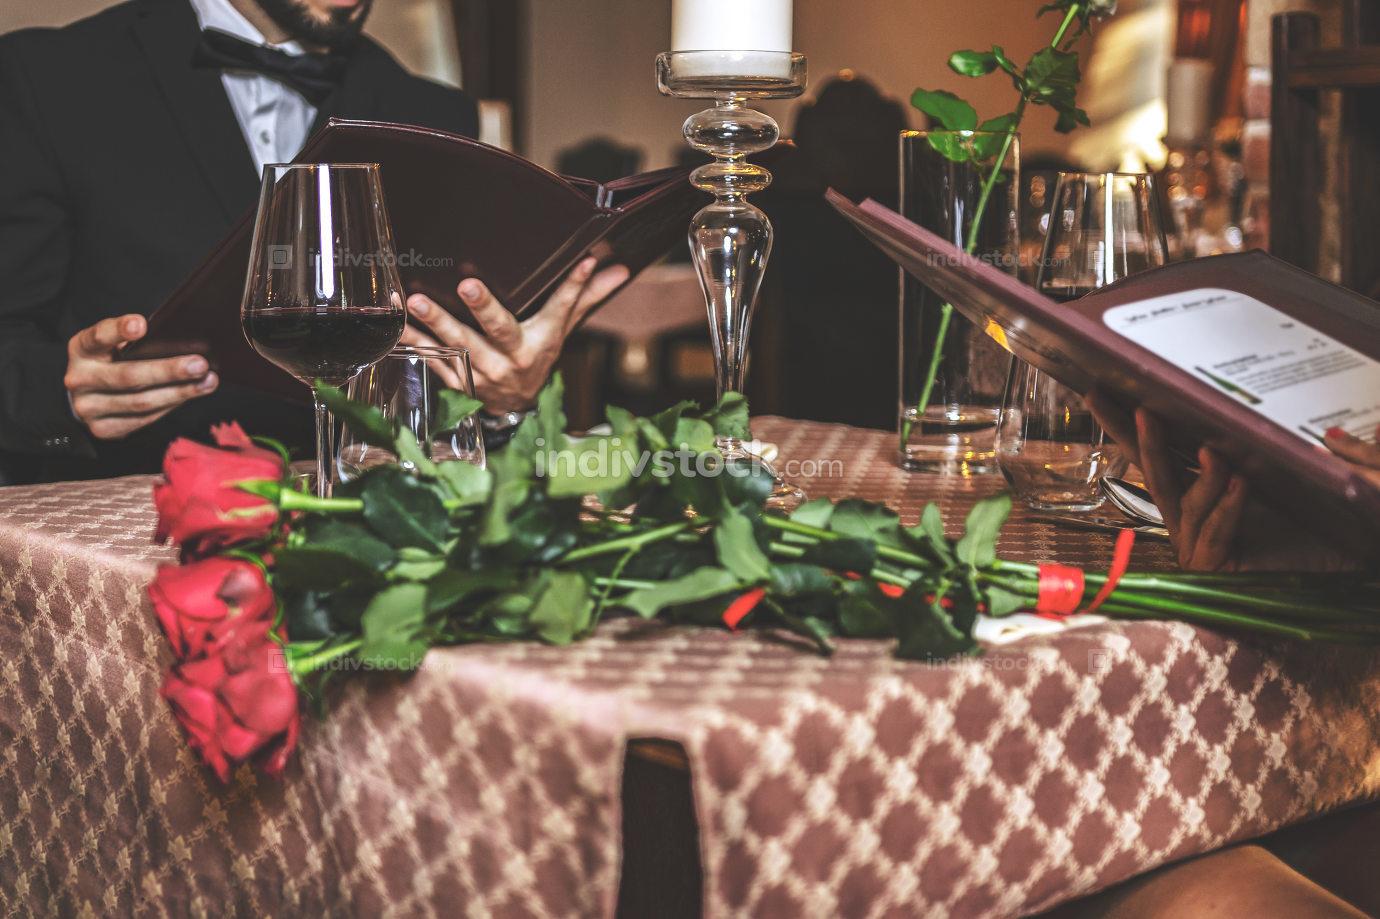 Blurred romantic dinner at the restaurant